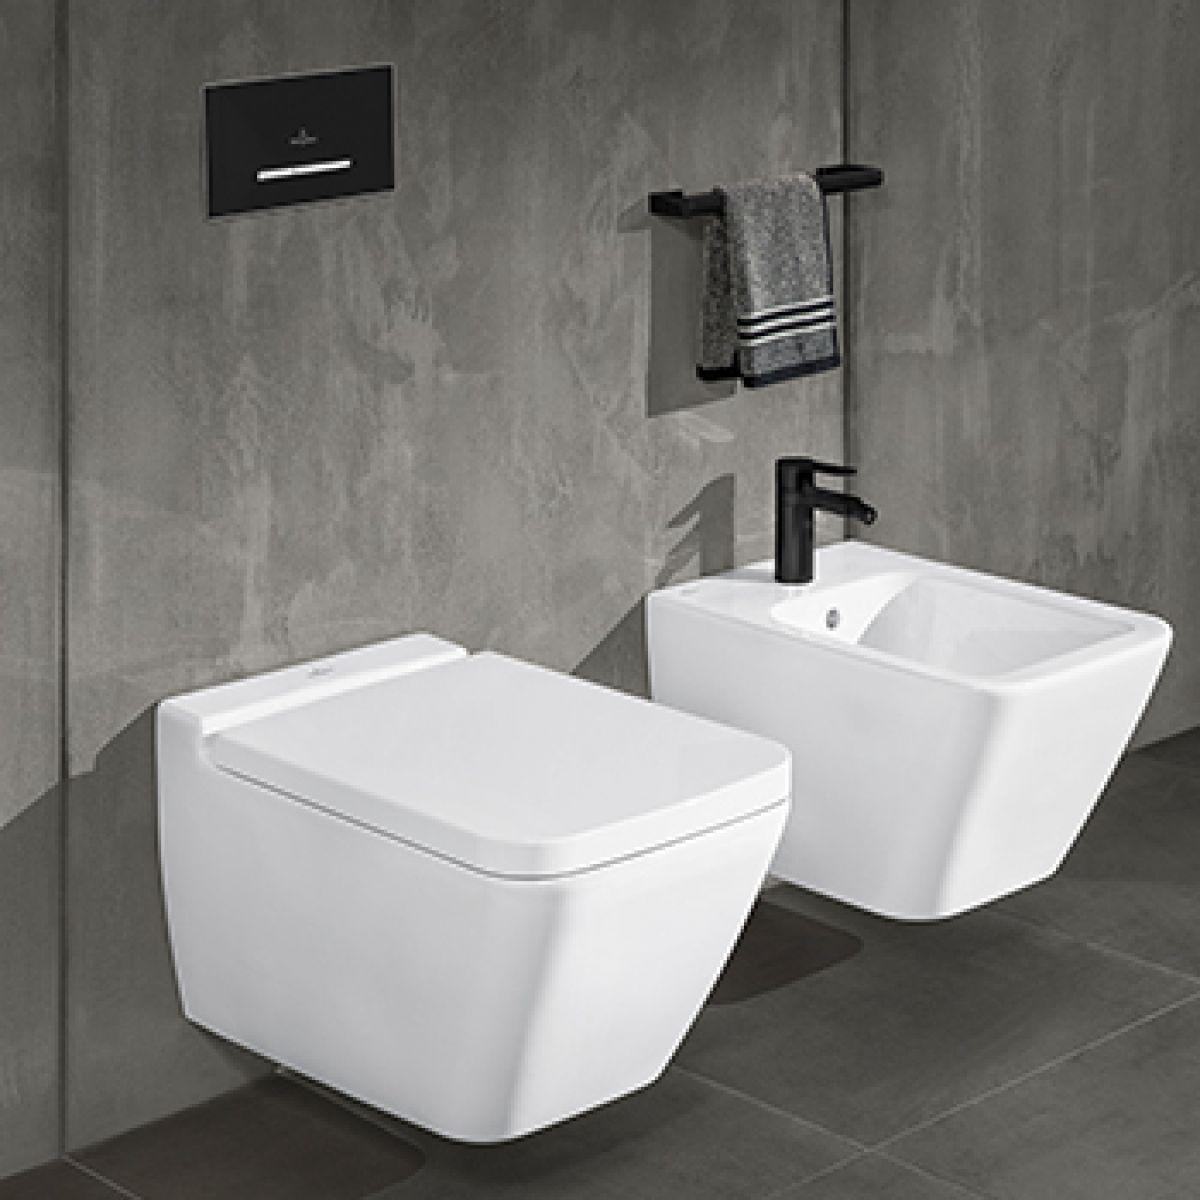 Villeroy & Boch Finion Wall Hung Rimless Toilet pour Toilette Villeroy Et Boch